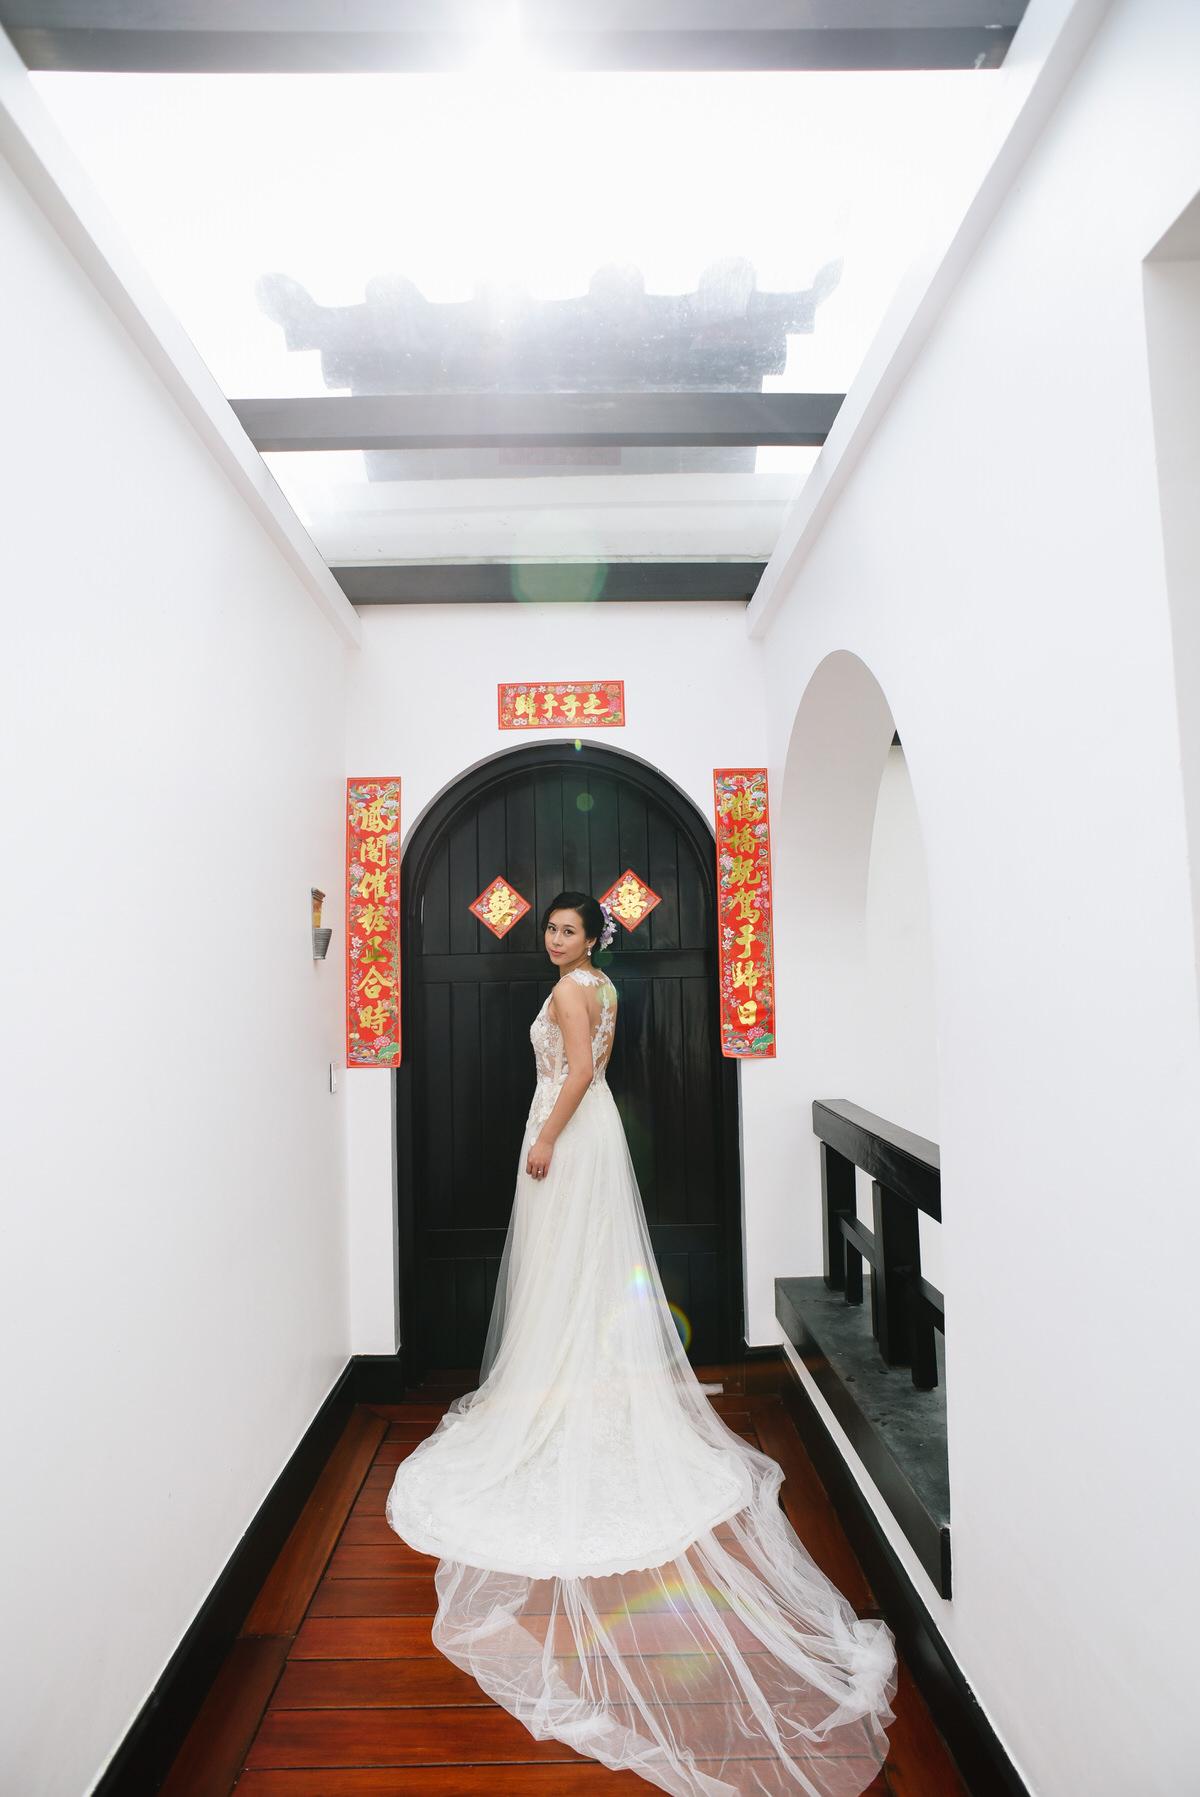 Intercontinental Danang_Wedding_52.jpg